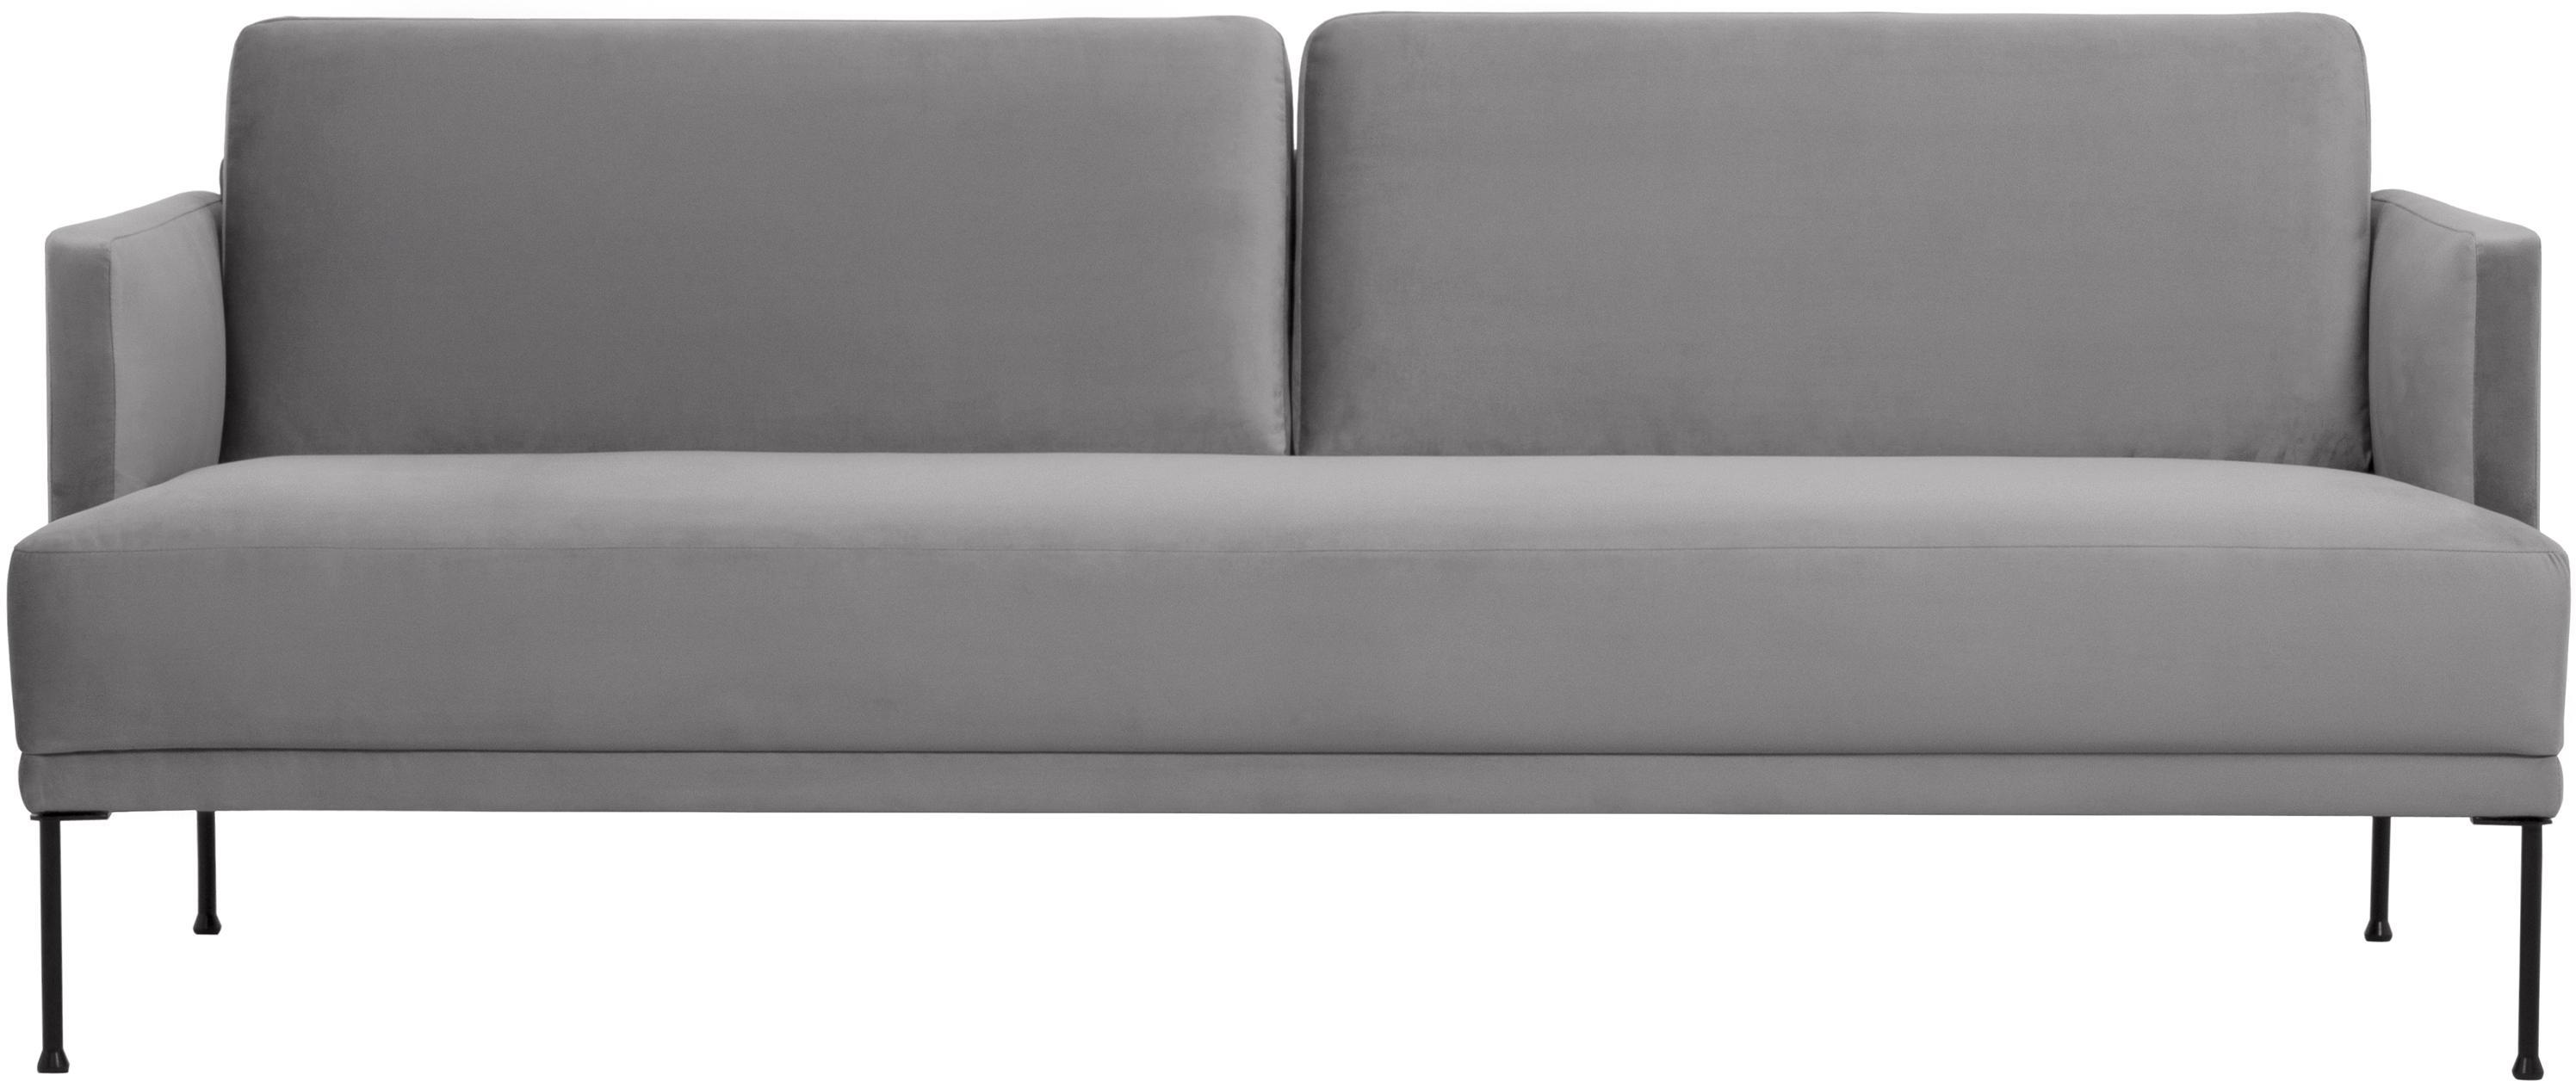 Samt-Sofa Fluente (3-Sitzer), Bezug: Samt (Hochwertiger Polyes, Gestell: Massives Kiefernholz, Samt Hellgrau, B 196 x T 85 cm